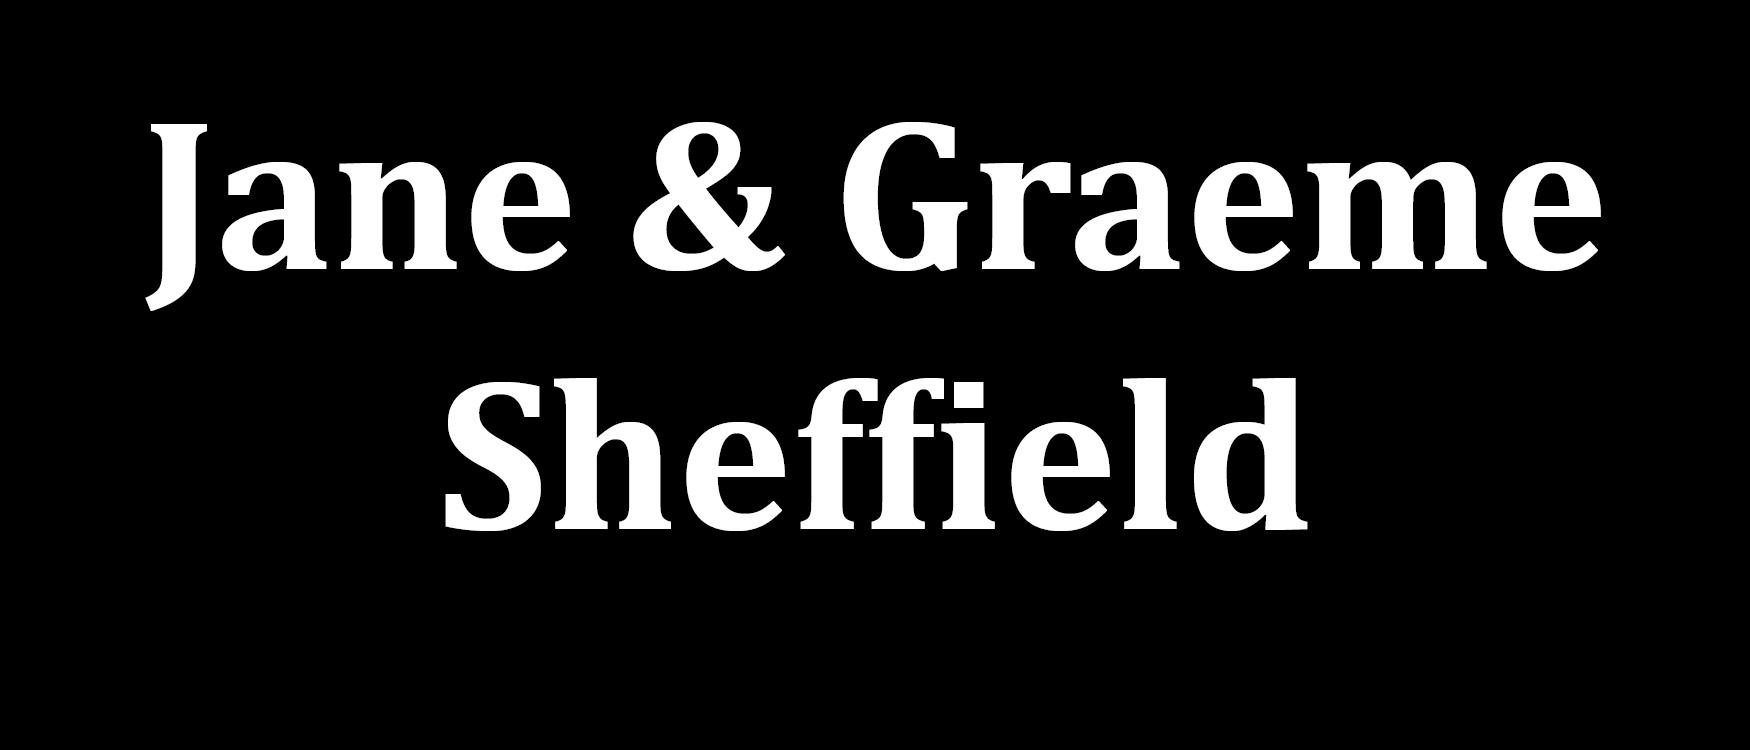 Jane & Graeme Sheffield